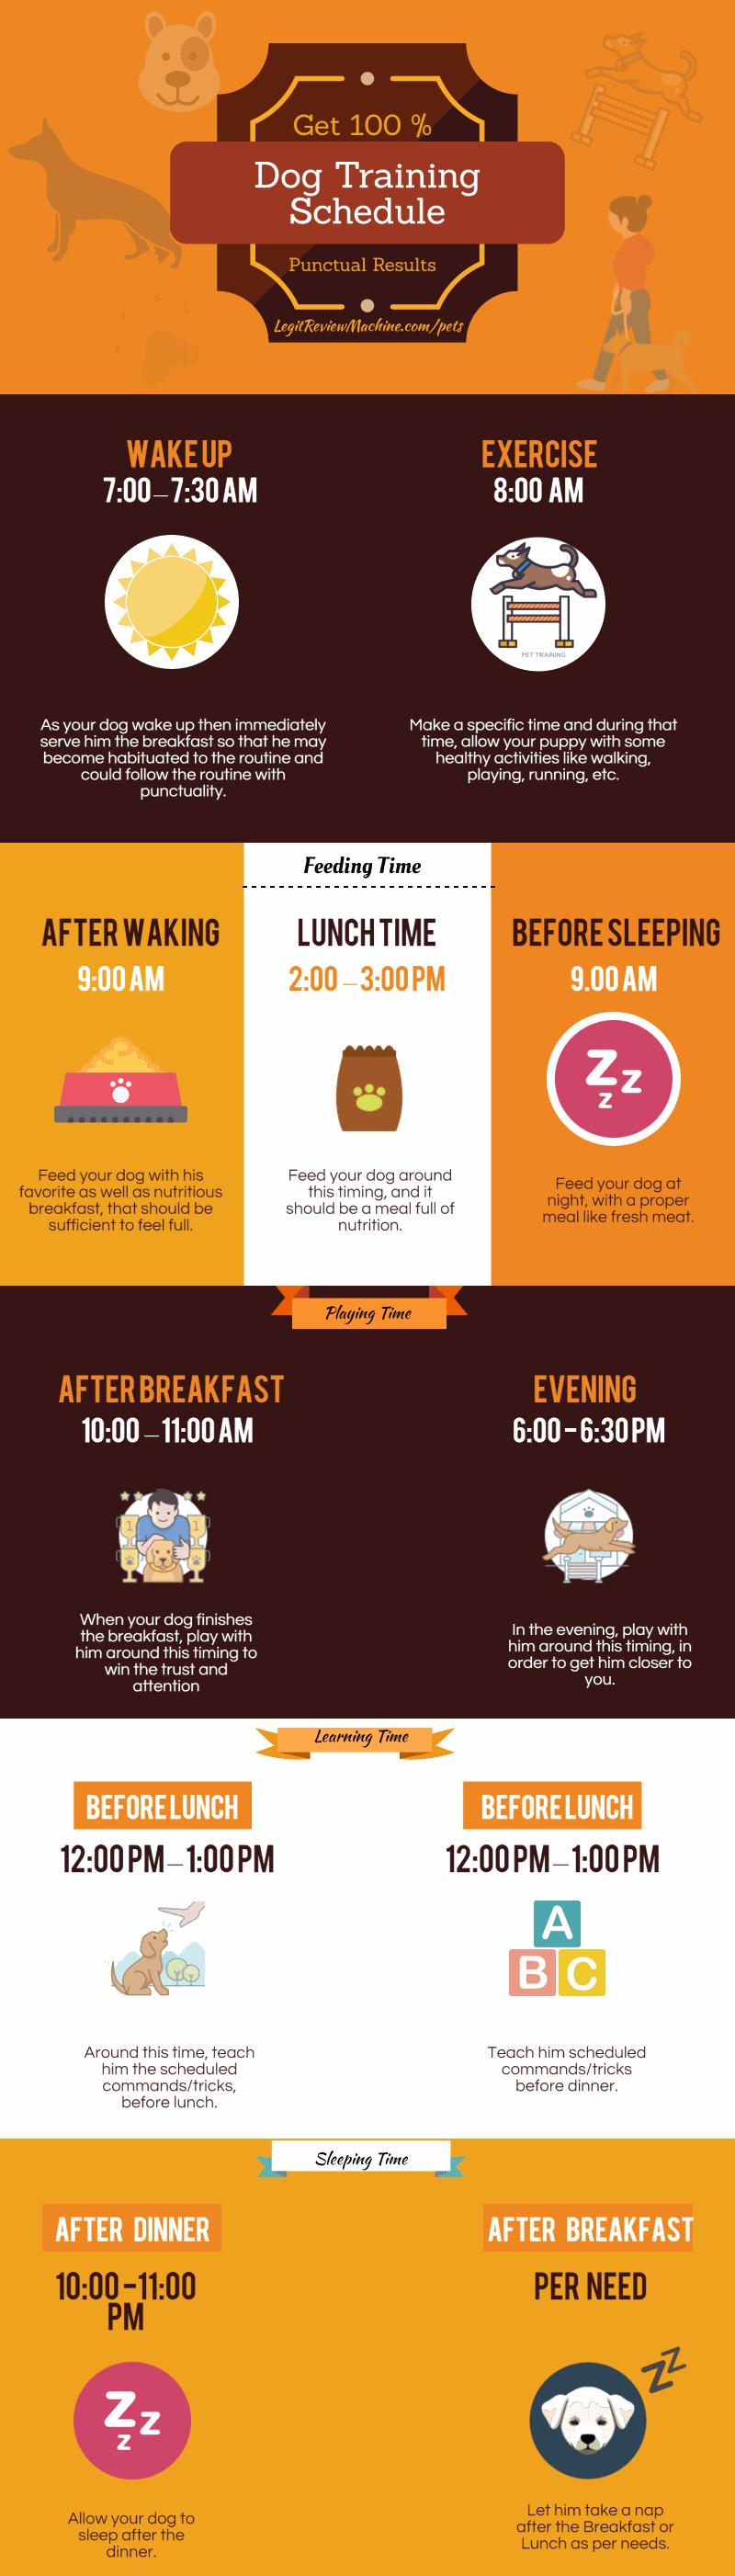 Dog Training Schedule Infographic